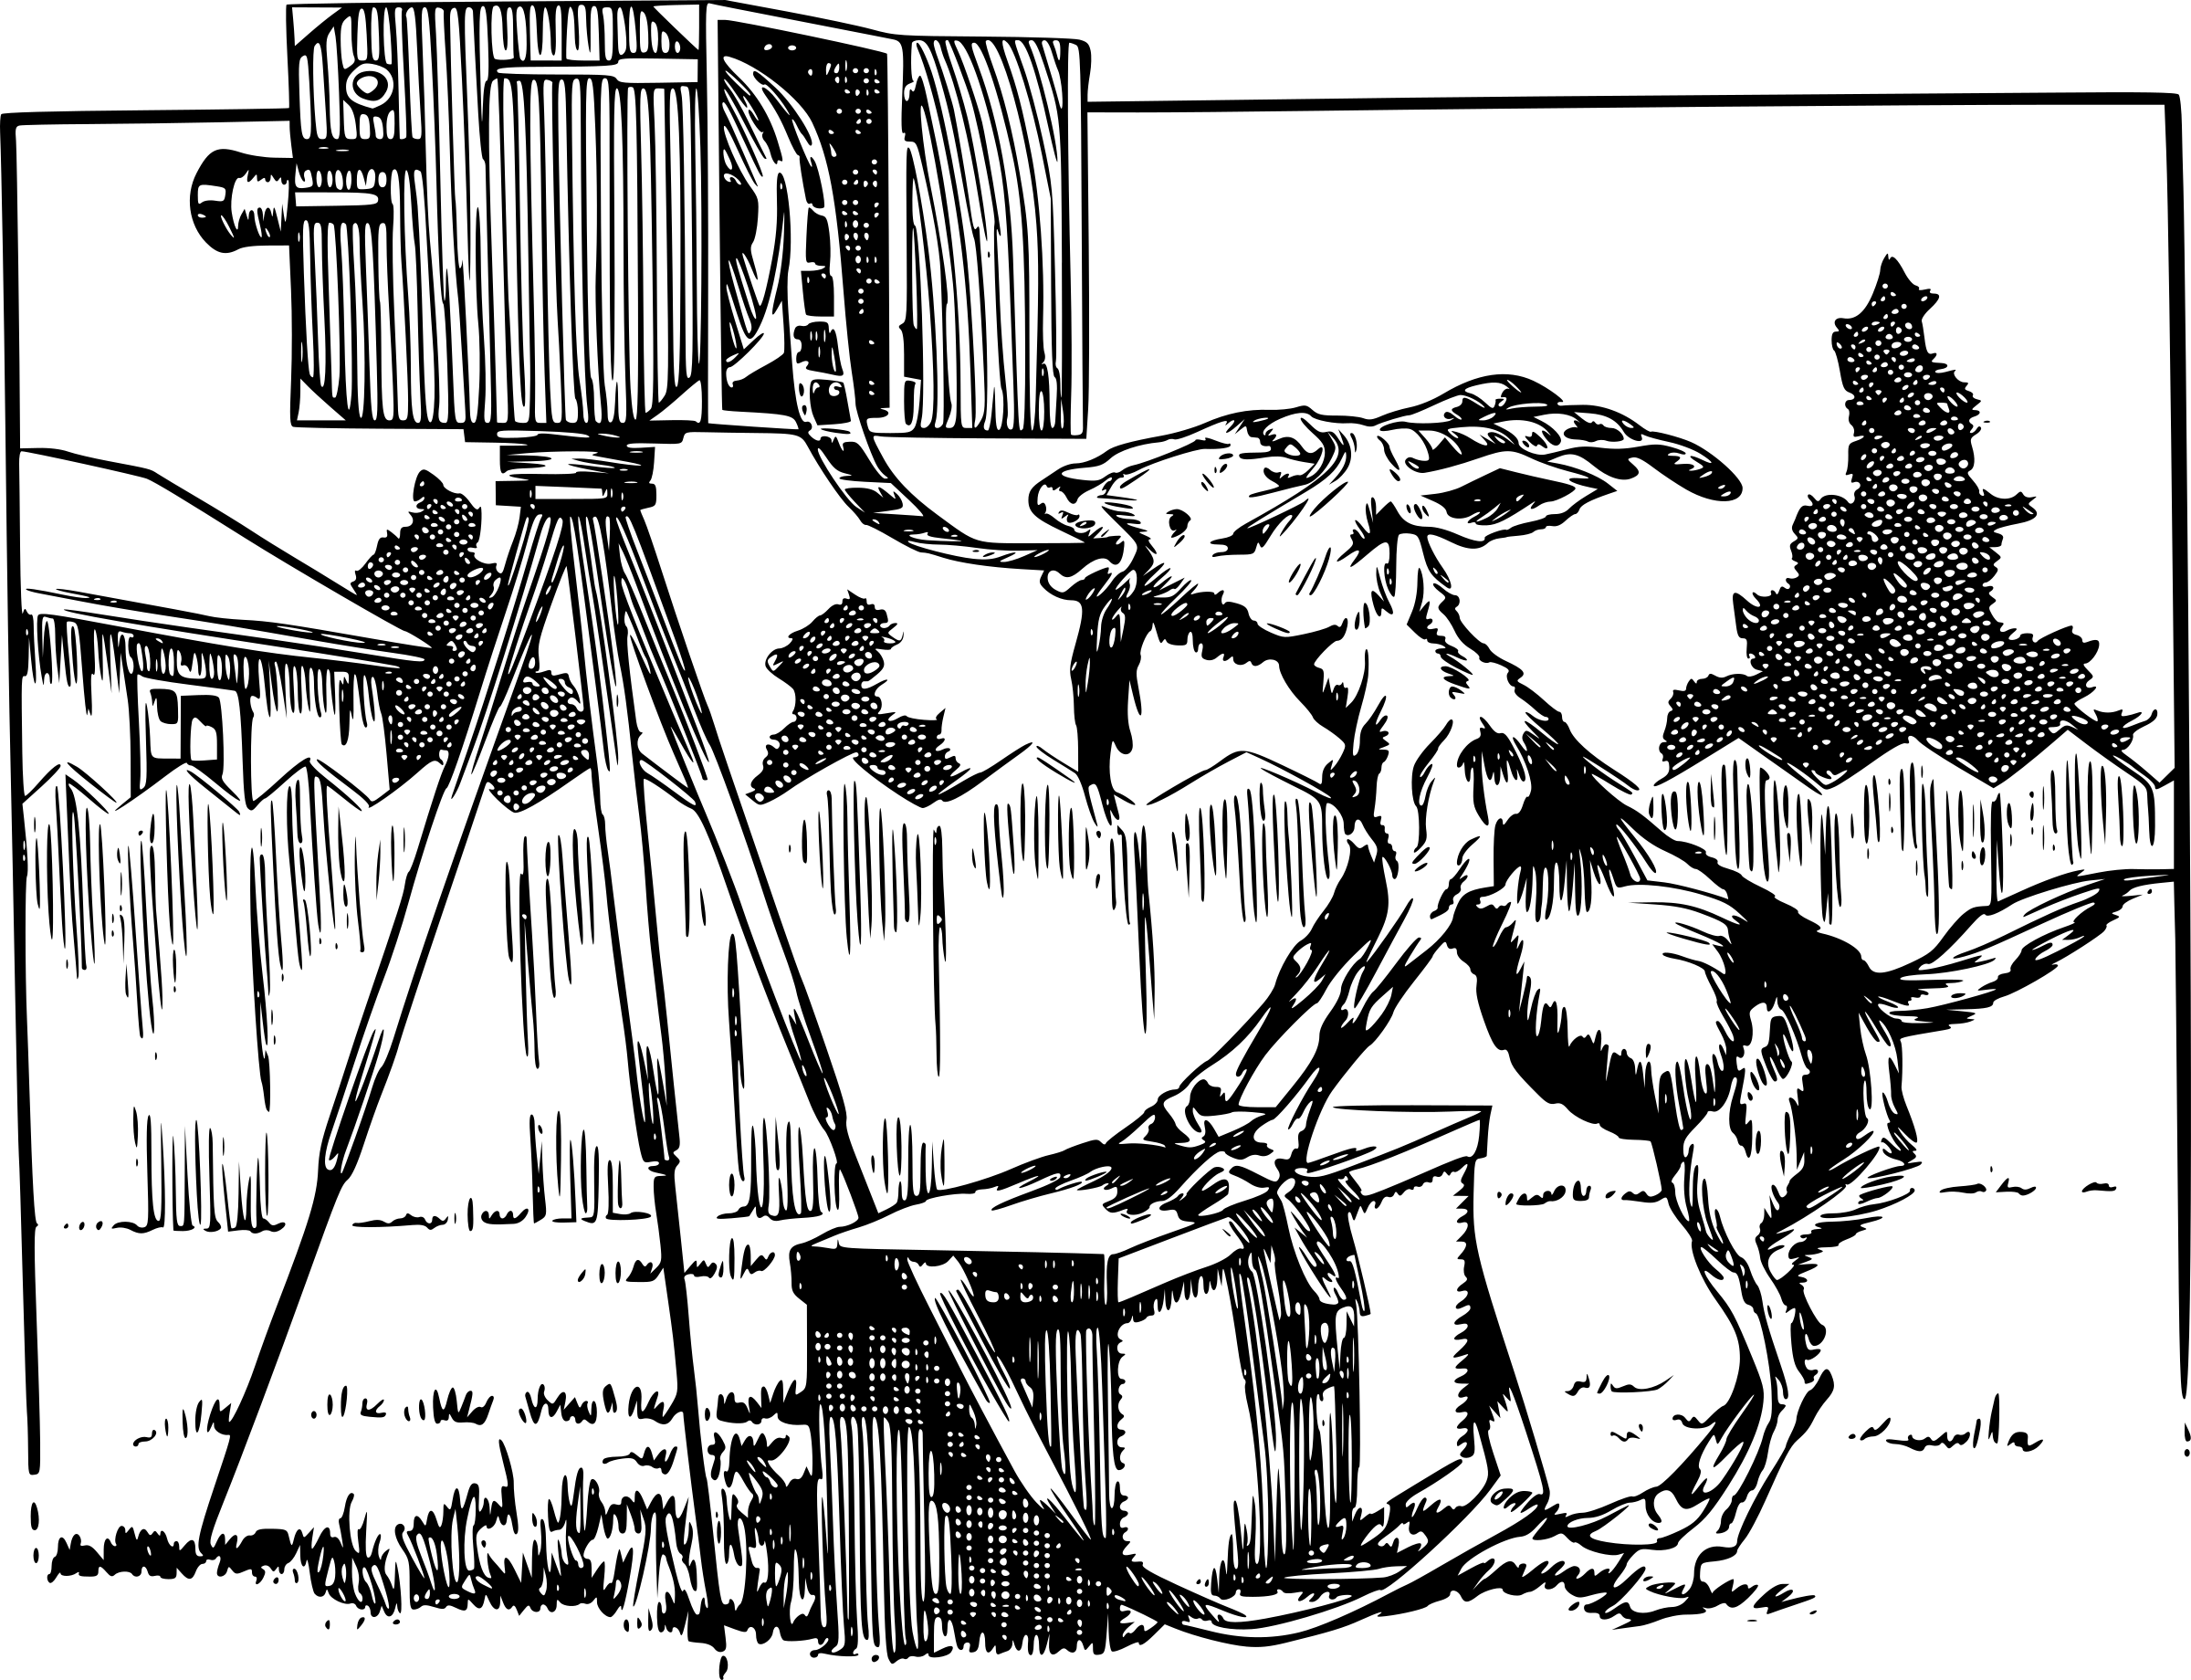 banner freeuse stock Film Camera Drawing at GetDrawings